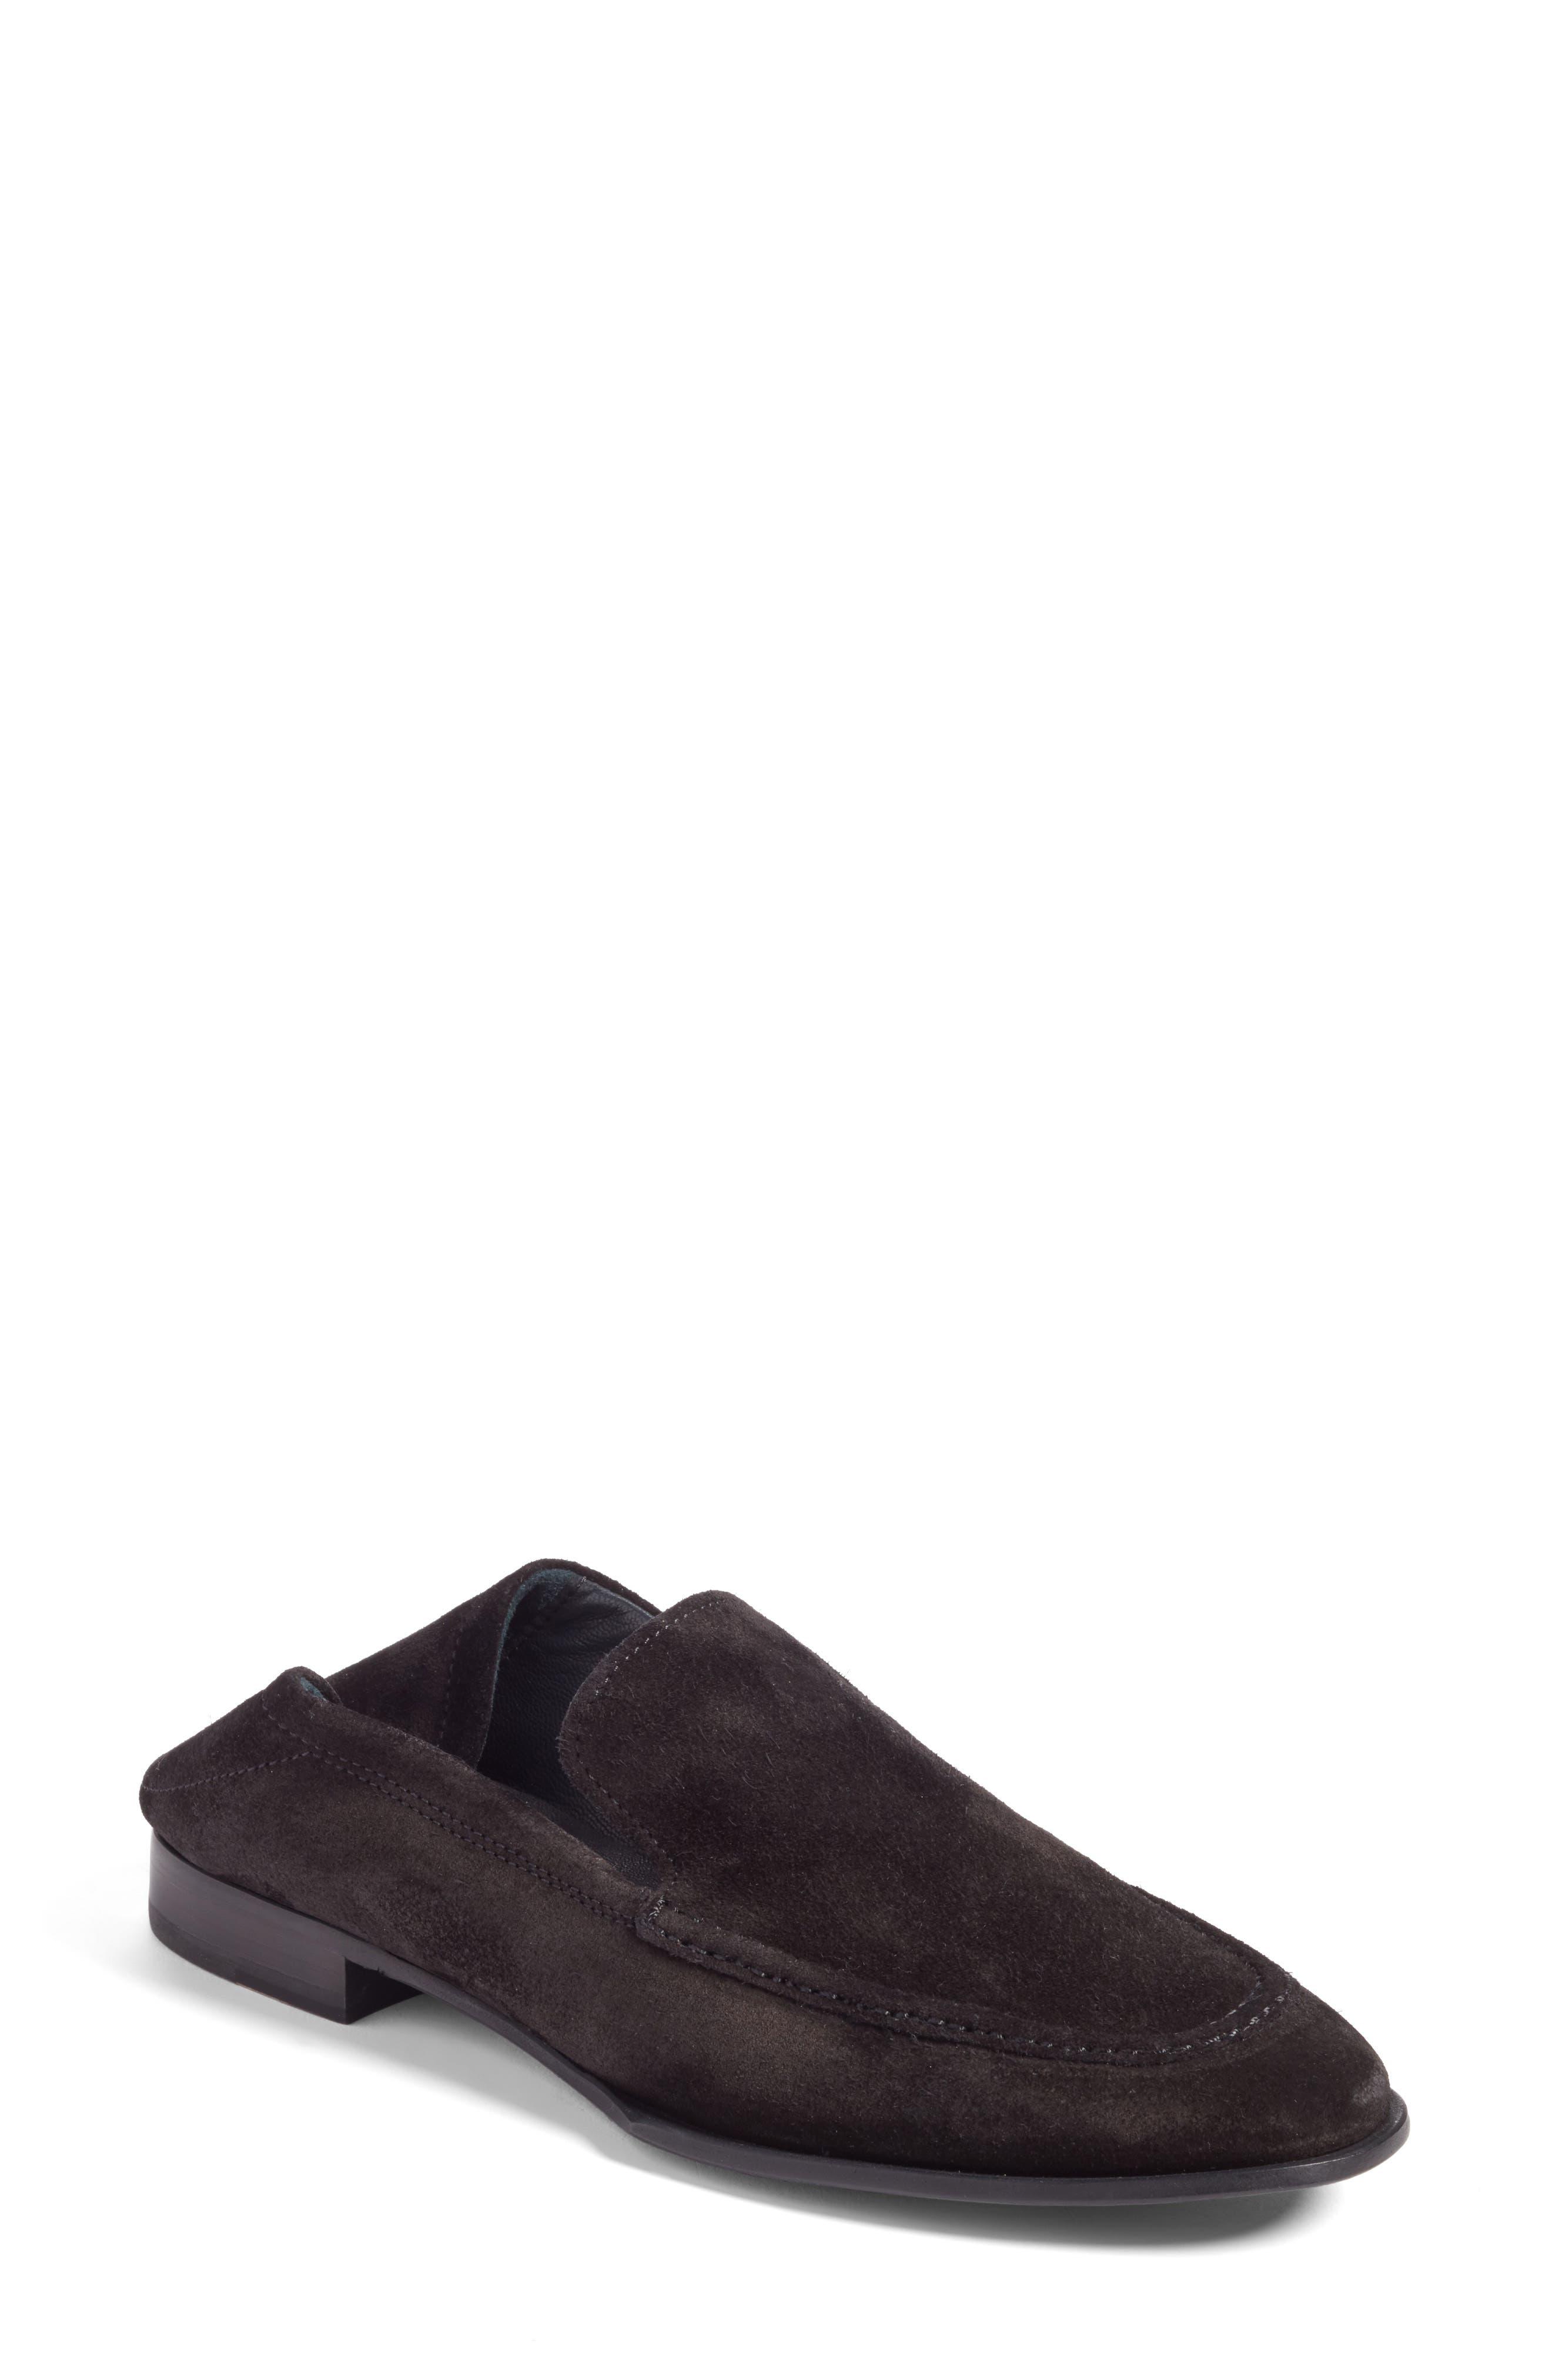 RAG & BONE Alix Convertible Loafer, Main, color, 008